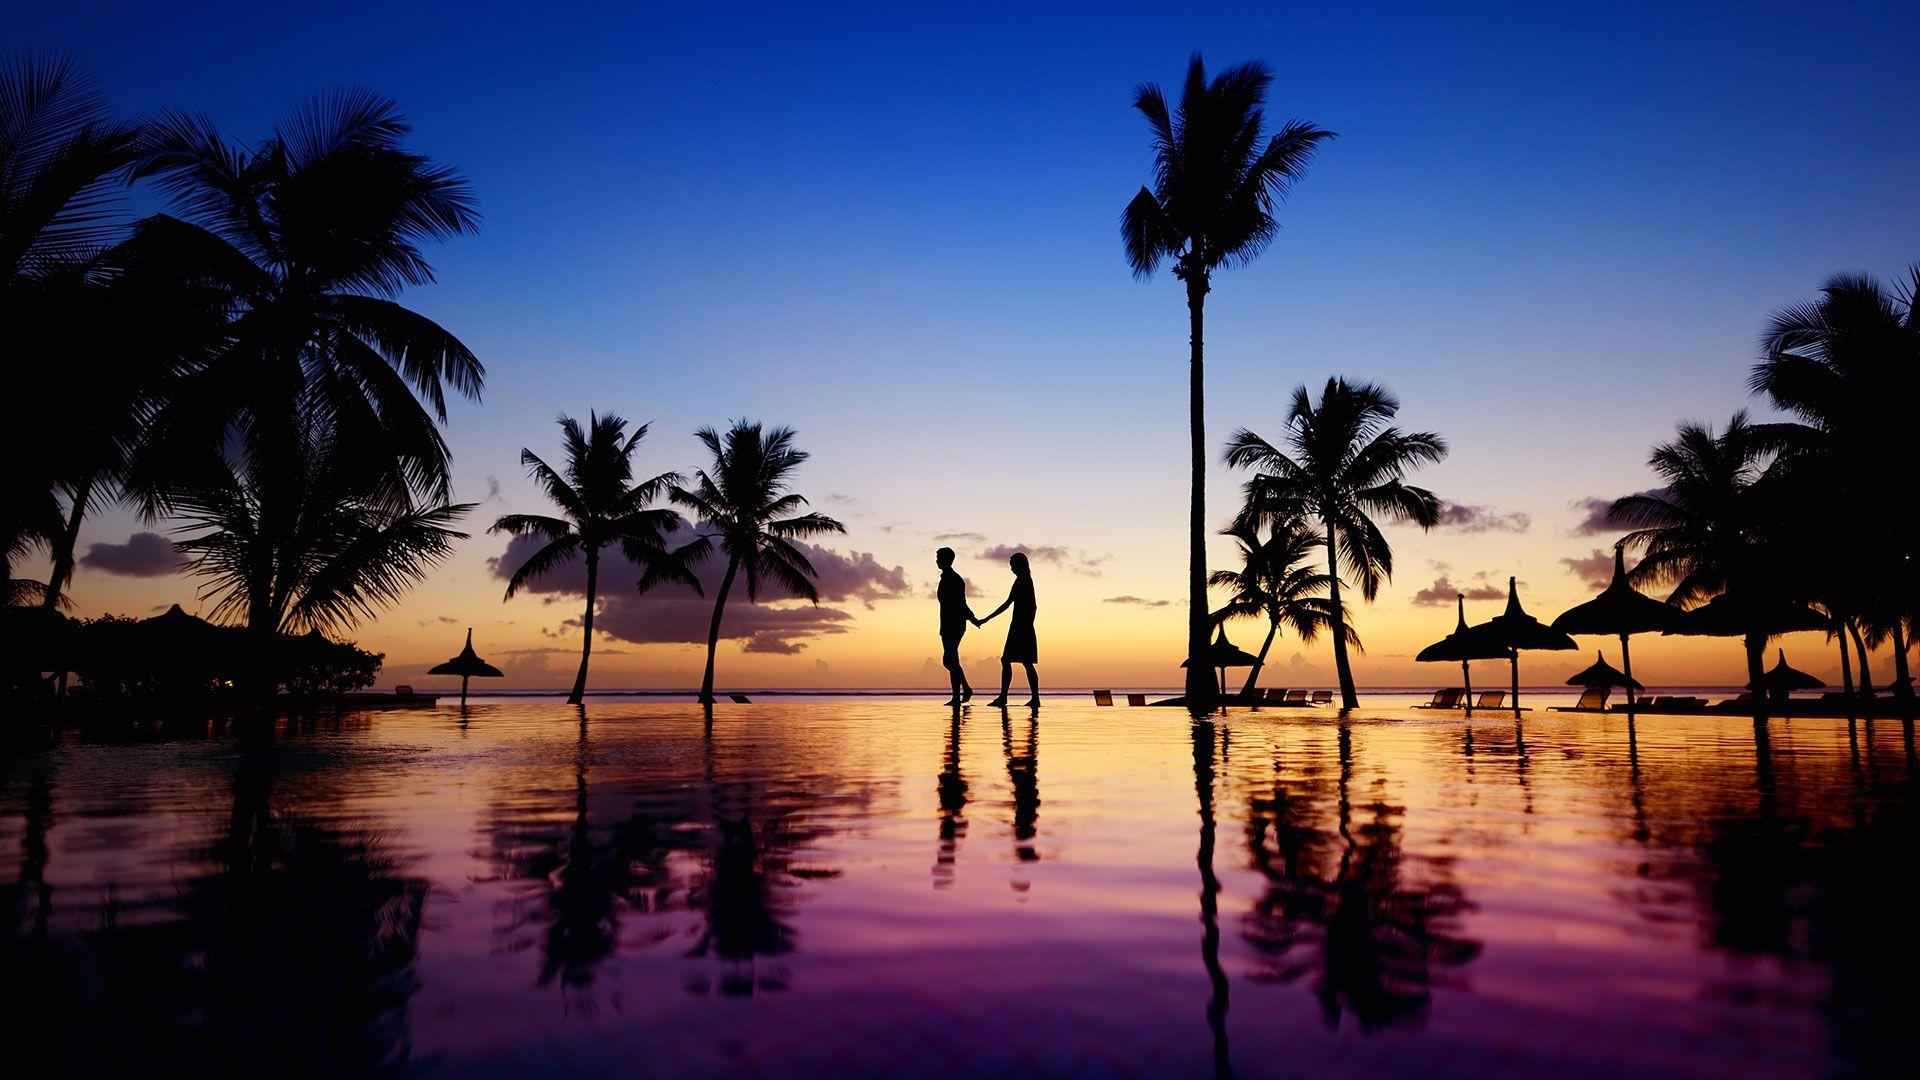 Sejur plaja Punta Cana, Republica Dominicana, 10 zile - 24 noiembrie 2021